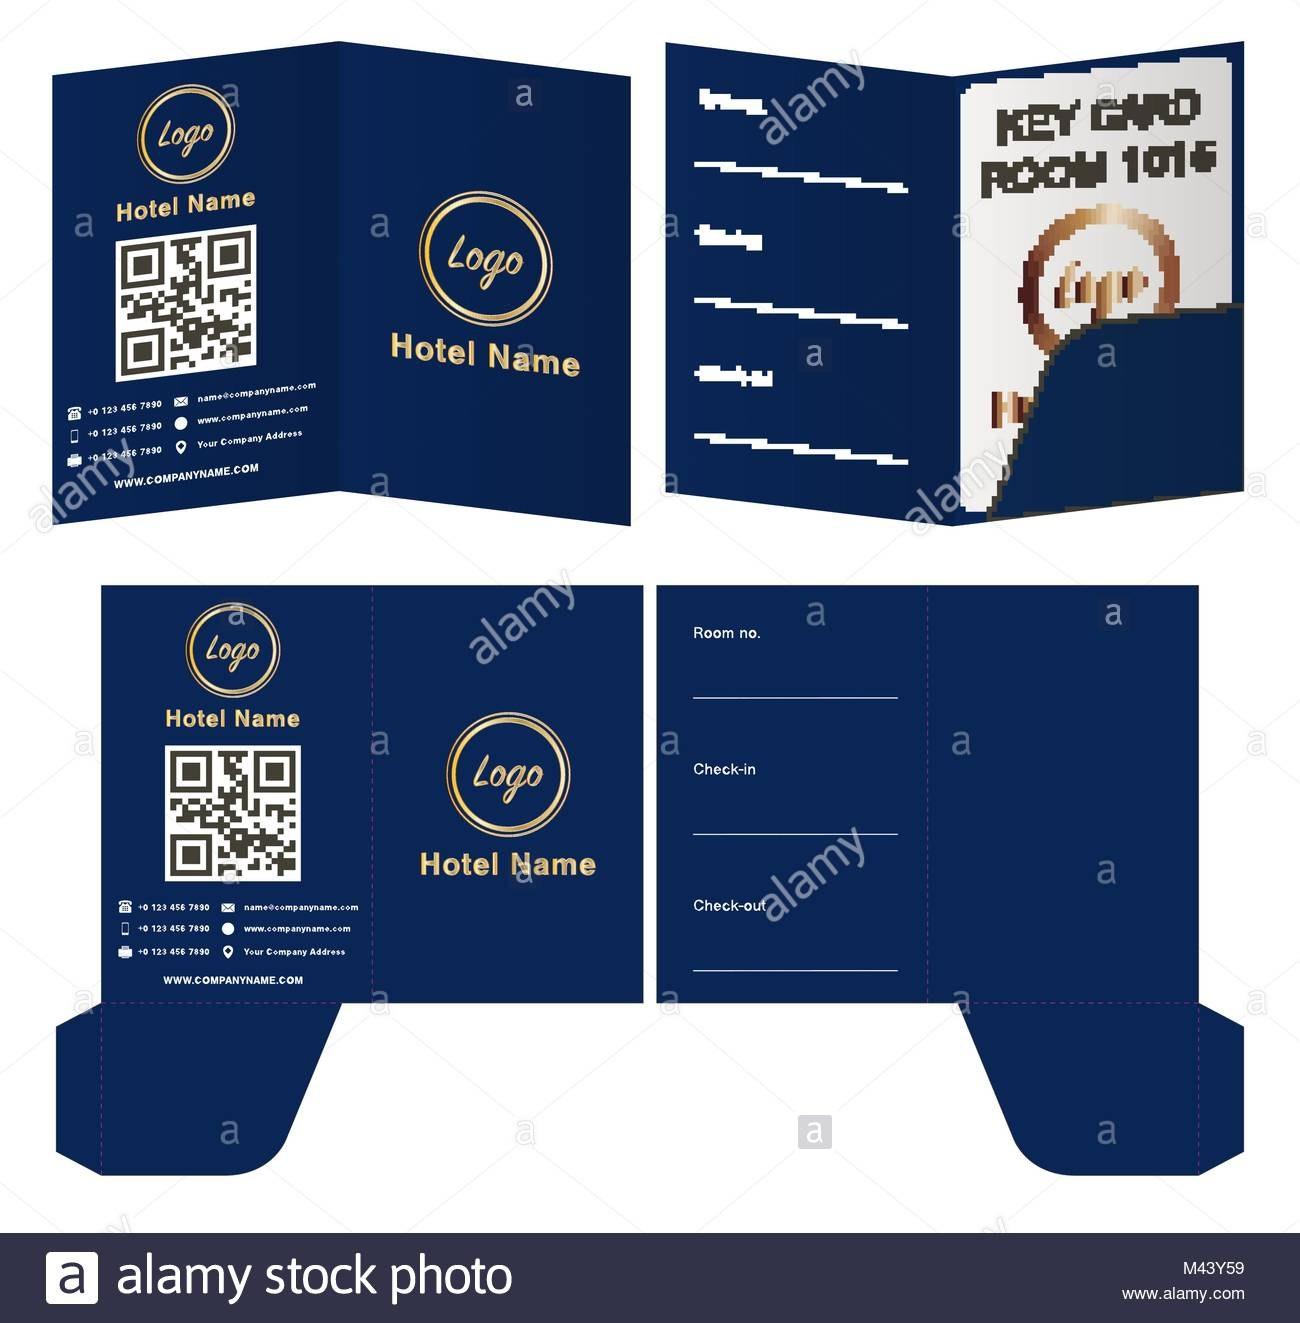 Hotel Key Card Holder Folder Package Template Stock Vector Art Inside Hotel Key Card Template